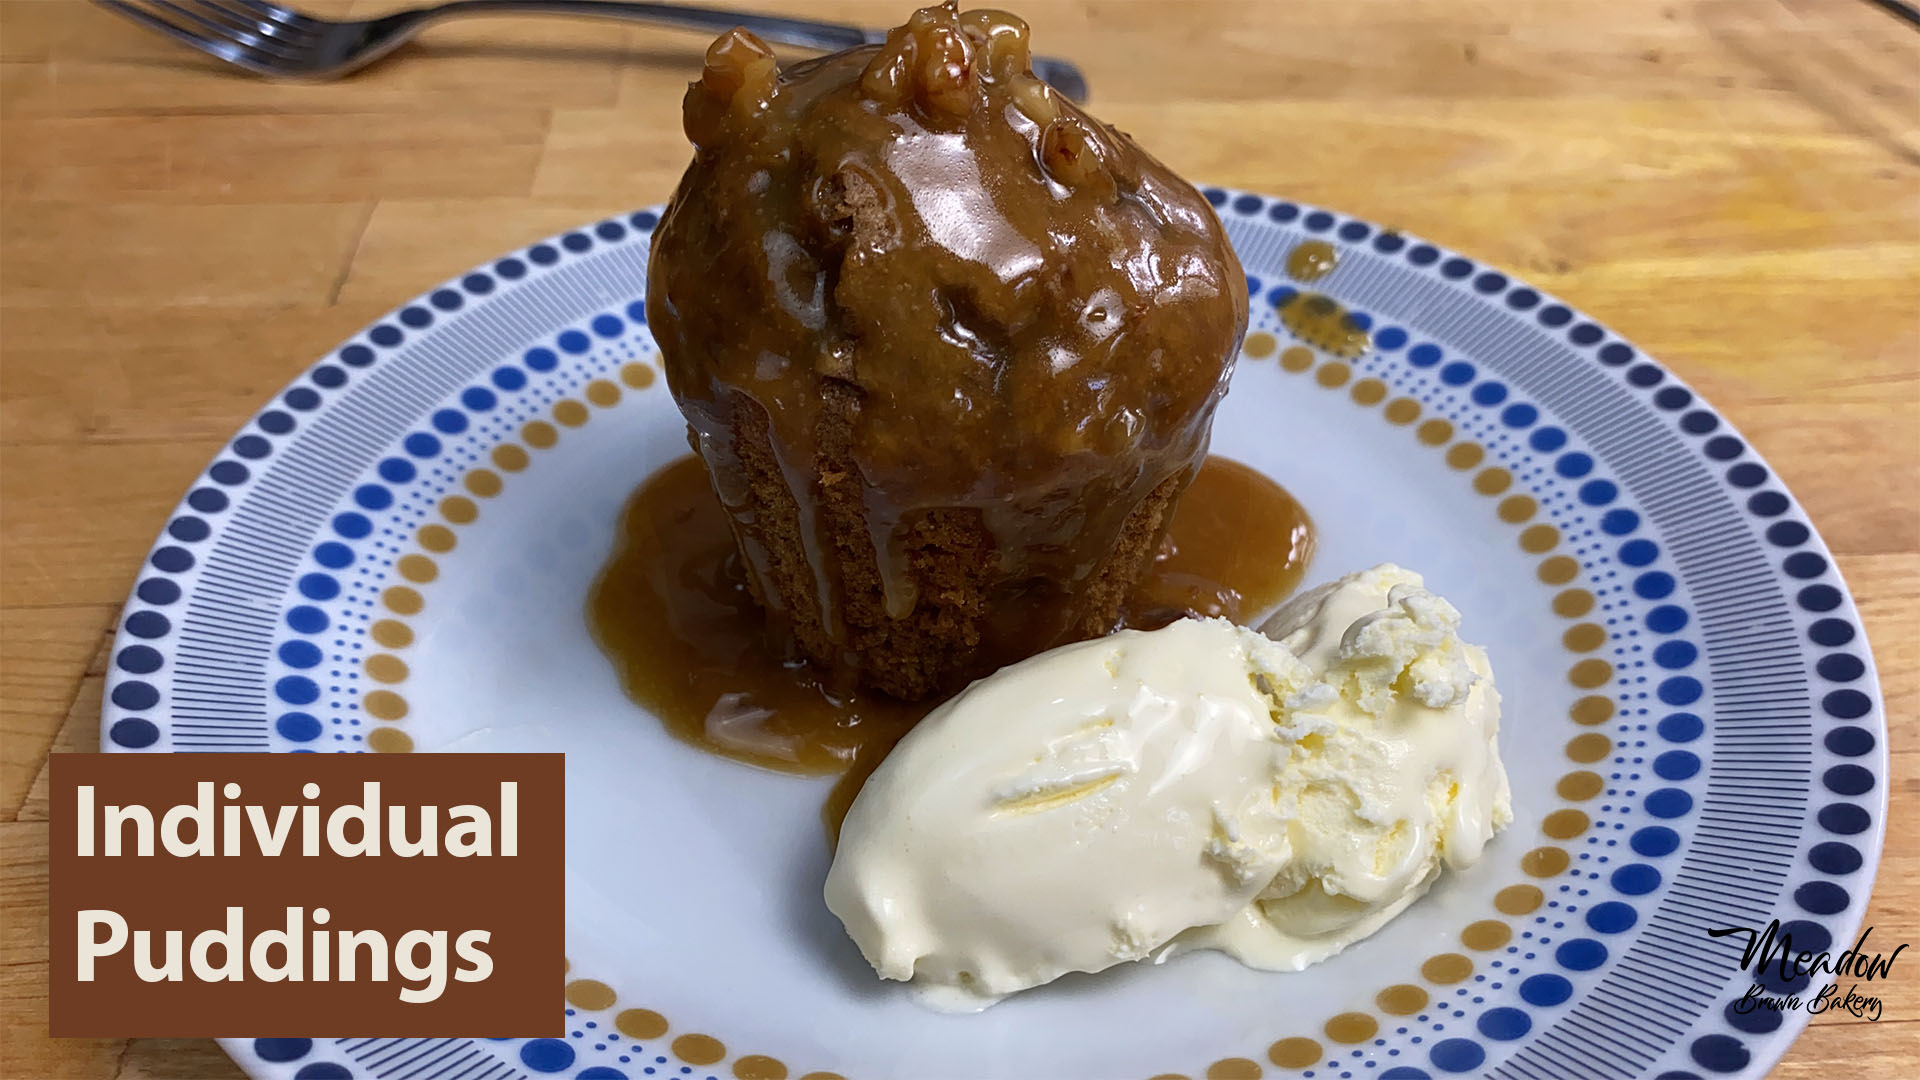 individual puddings walnut and coffee